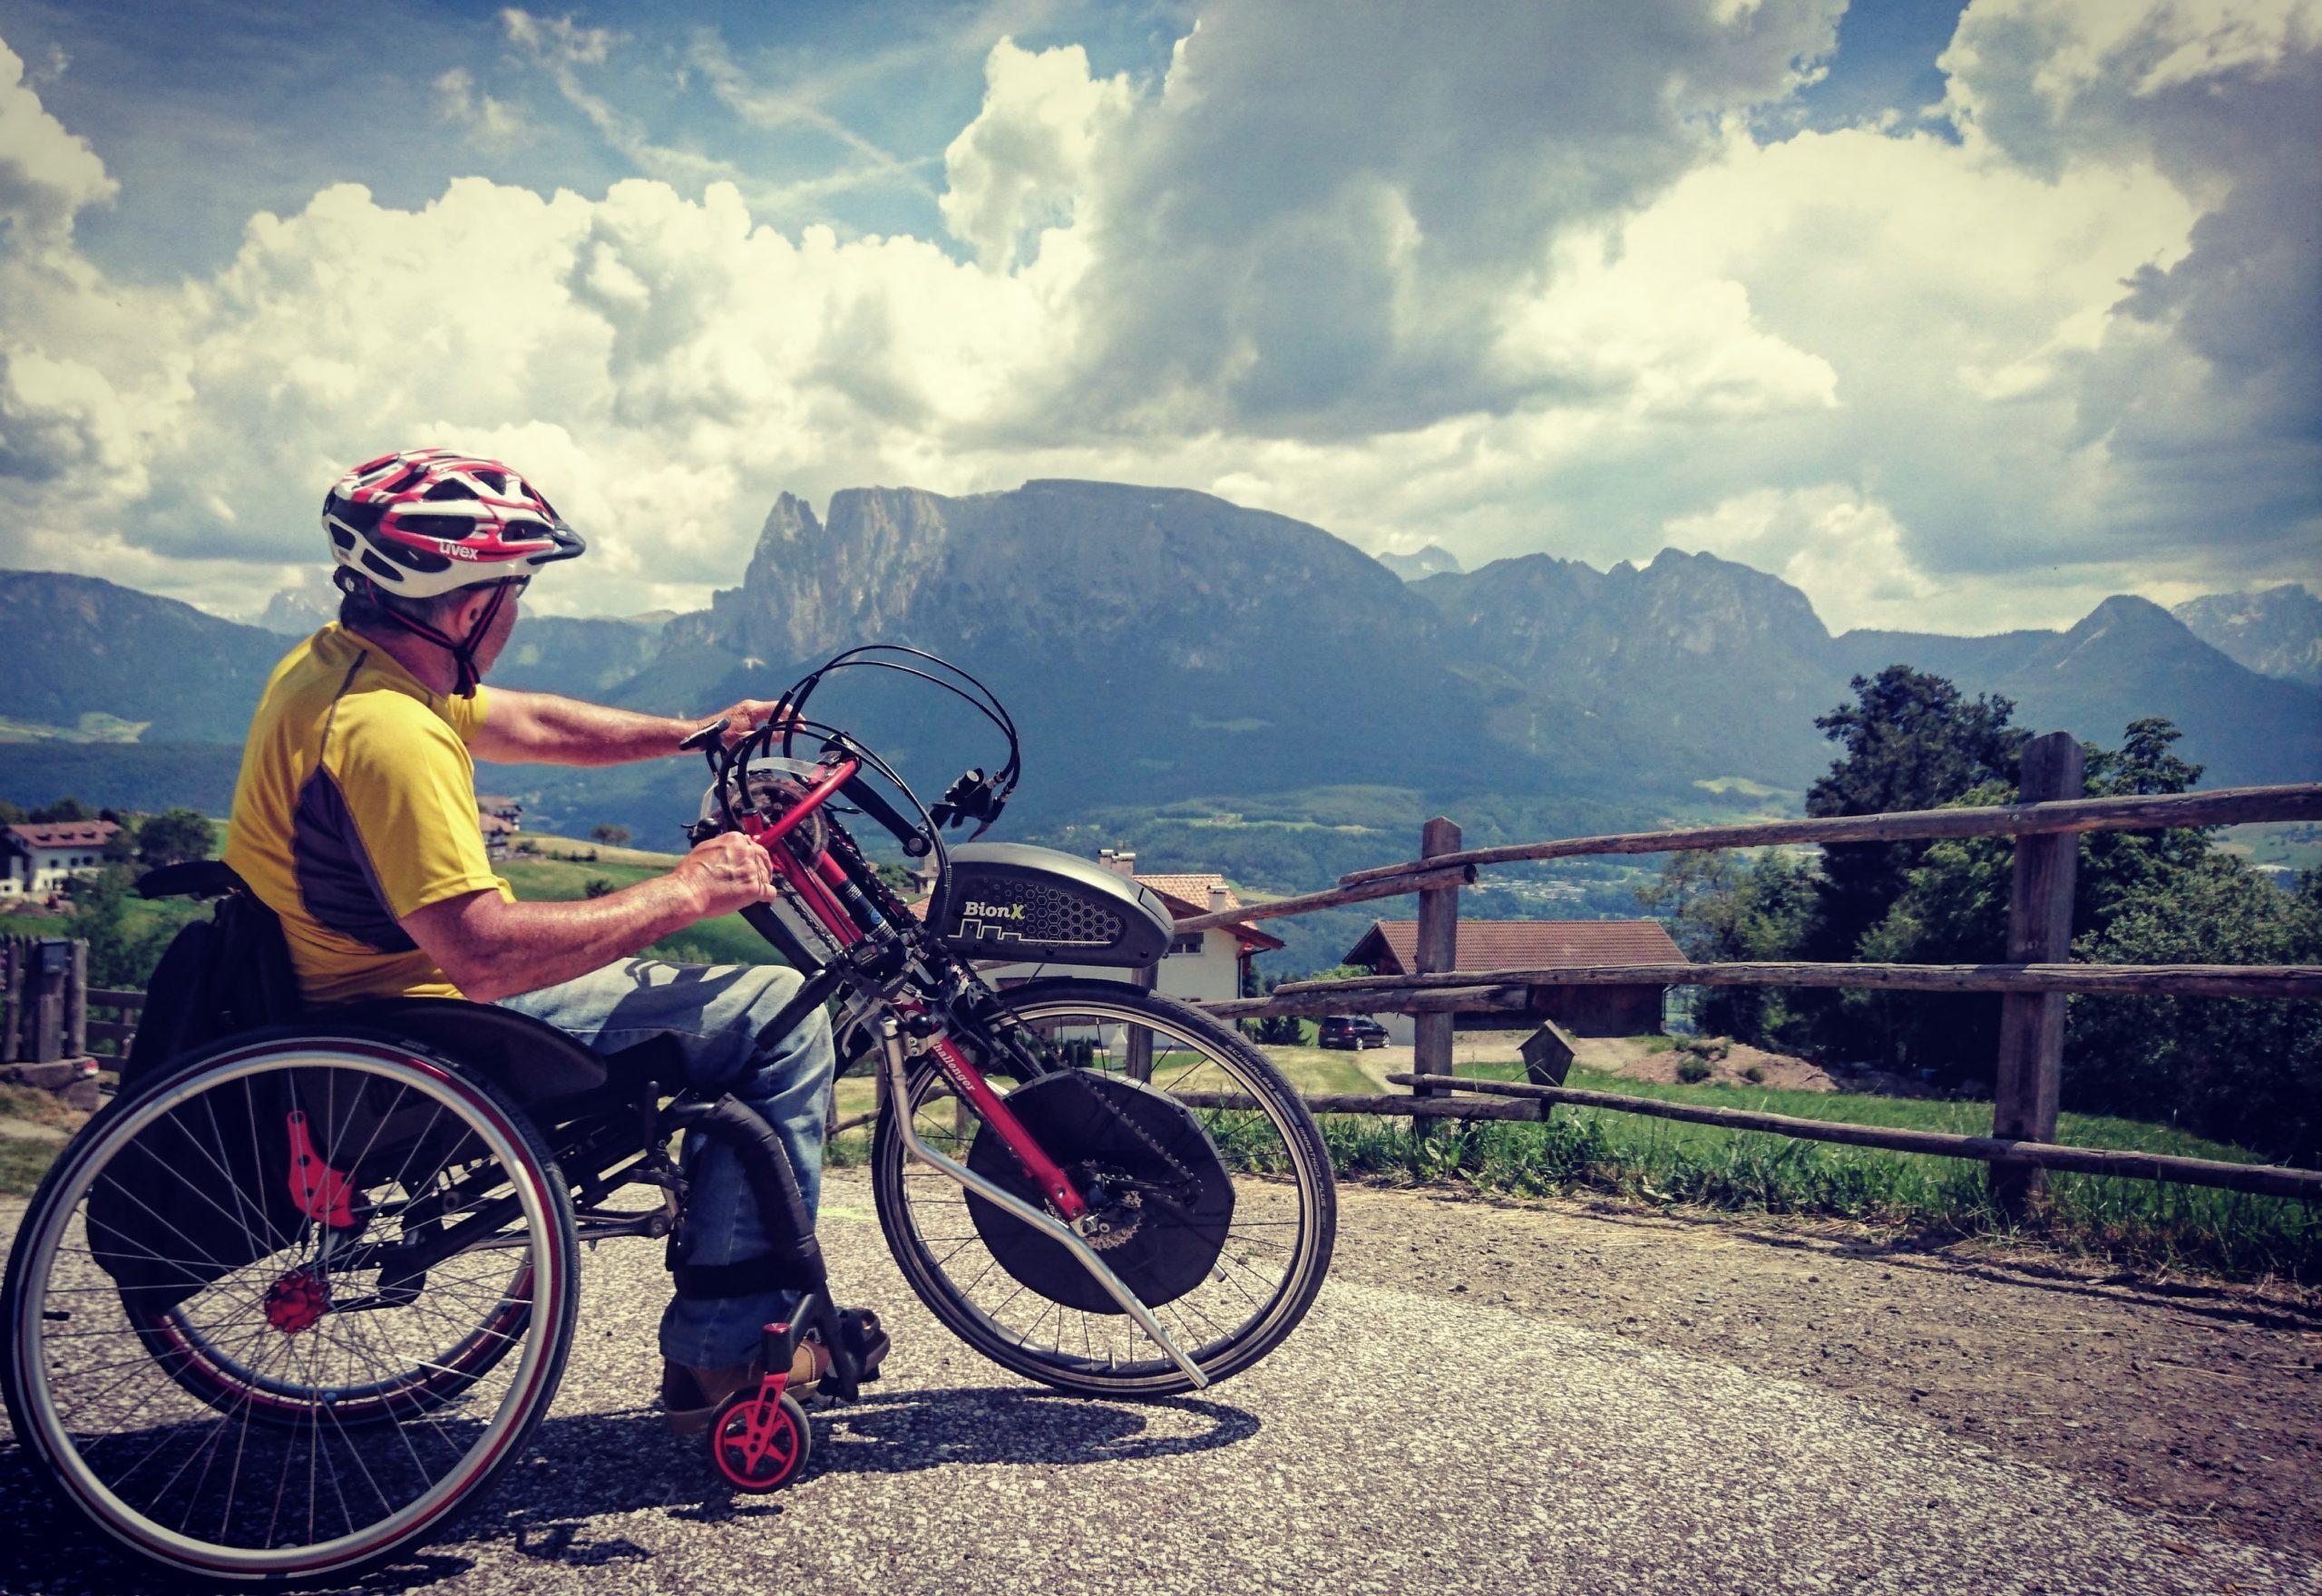 Sedia a rotelle_tours_Rollchair_Sport_Equipment_Handbike_Ritten_Renon_Schlern_Sciliar